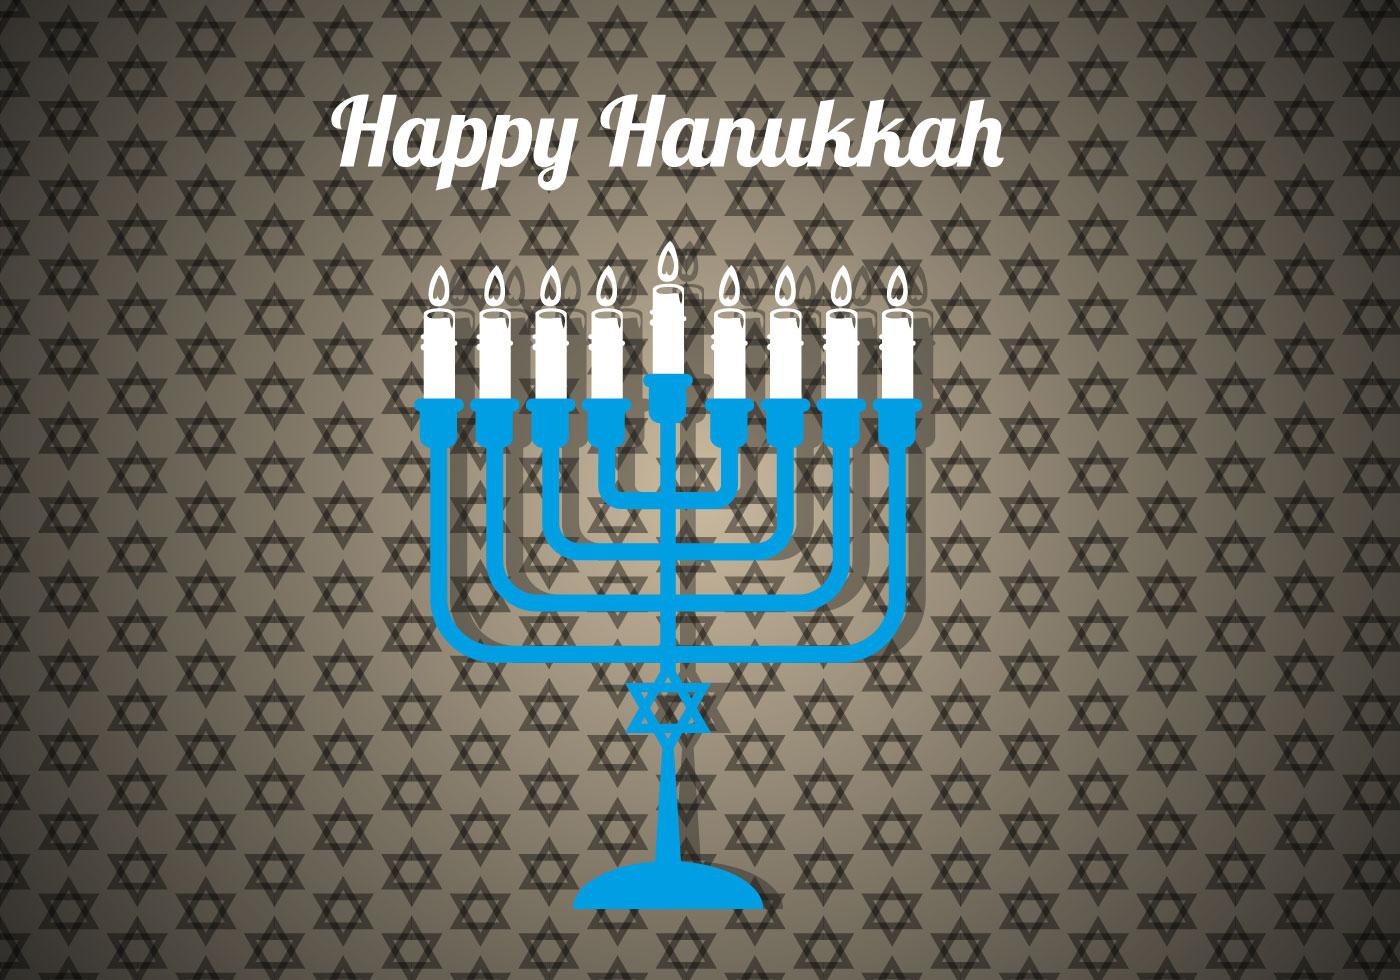 Free Happy Hanukkah Vector Download Free Vector Art Stock